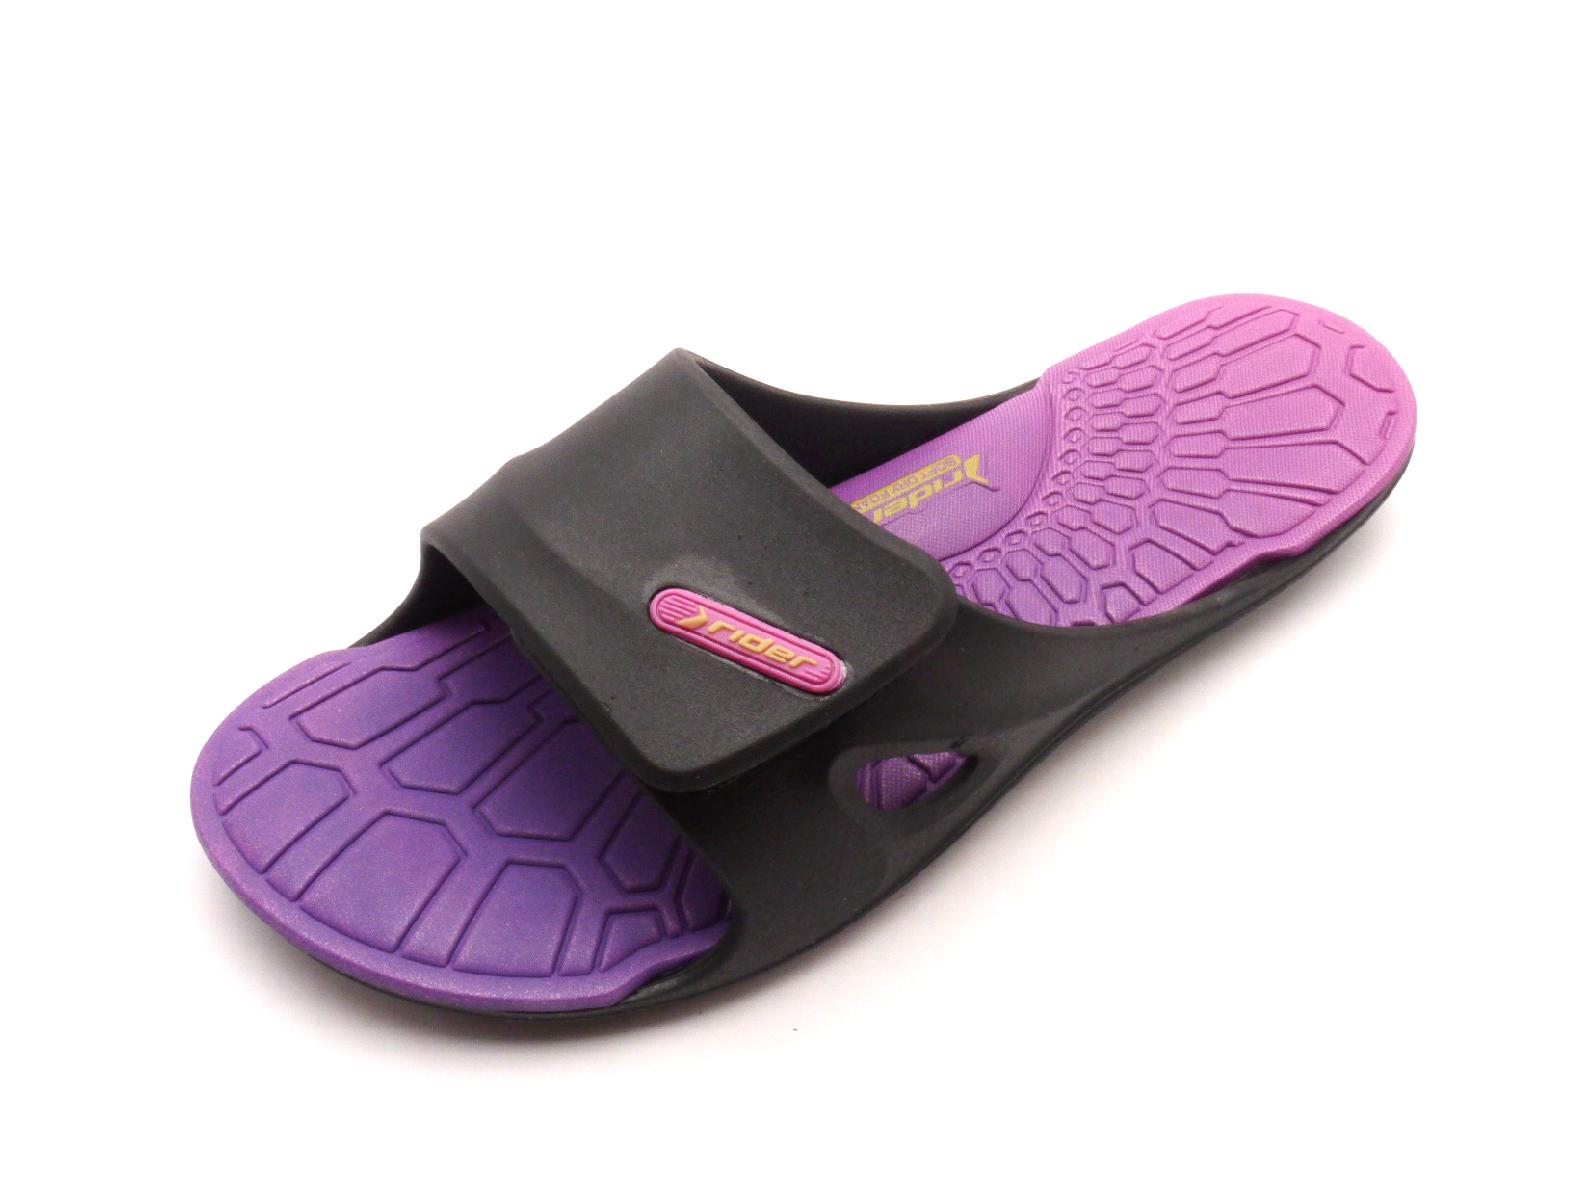 Dámské pantofle Rider 81921 Velikost: 40